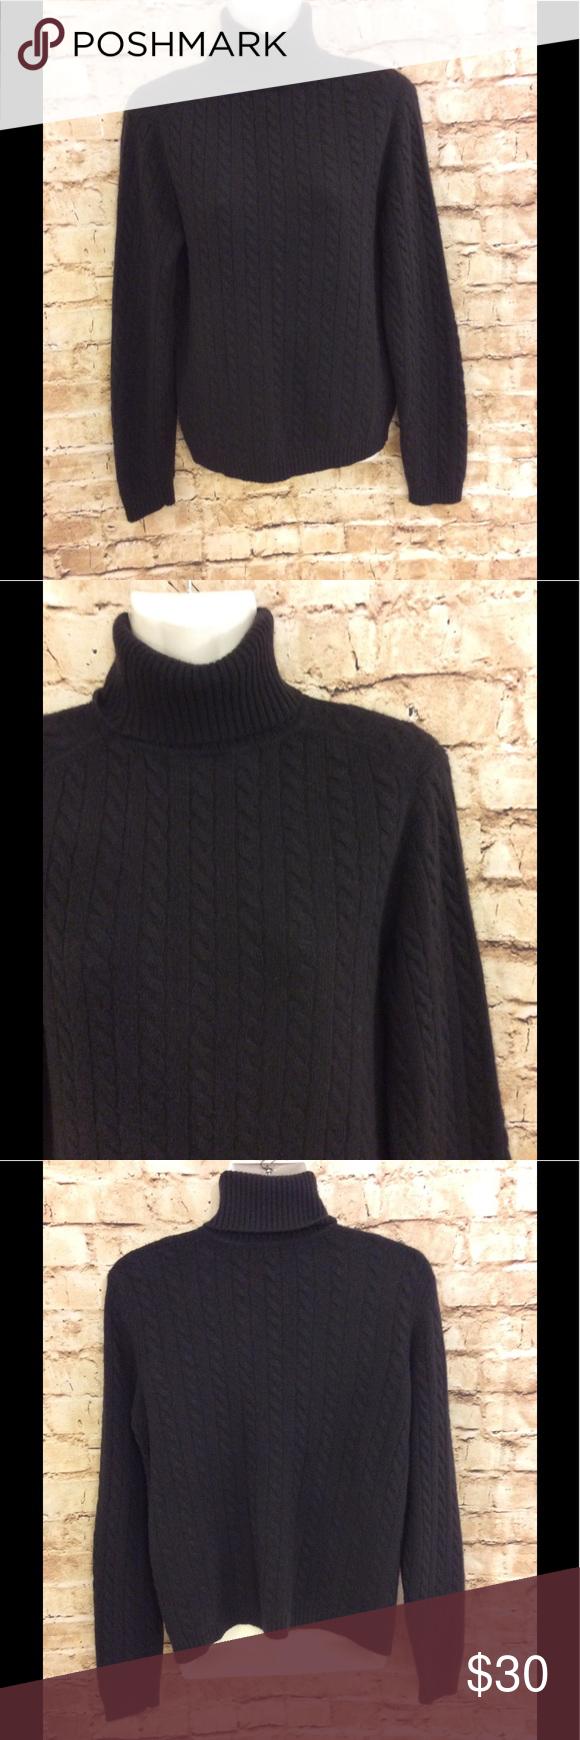 Ann Taylor 100% cashmere black turtleneck sweater | Cashmere